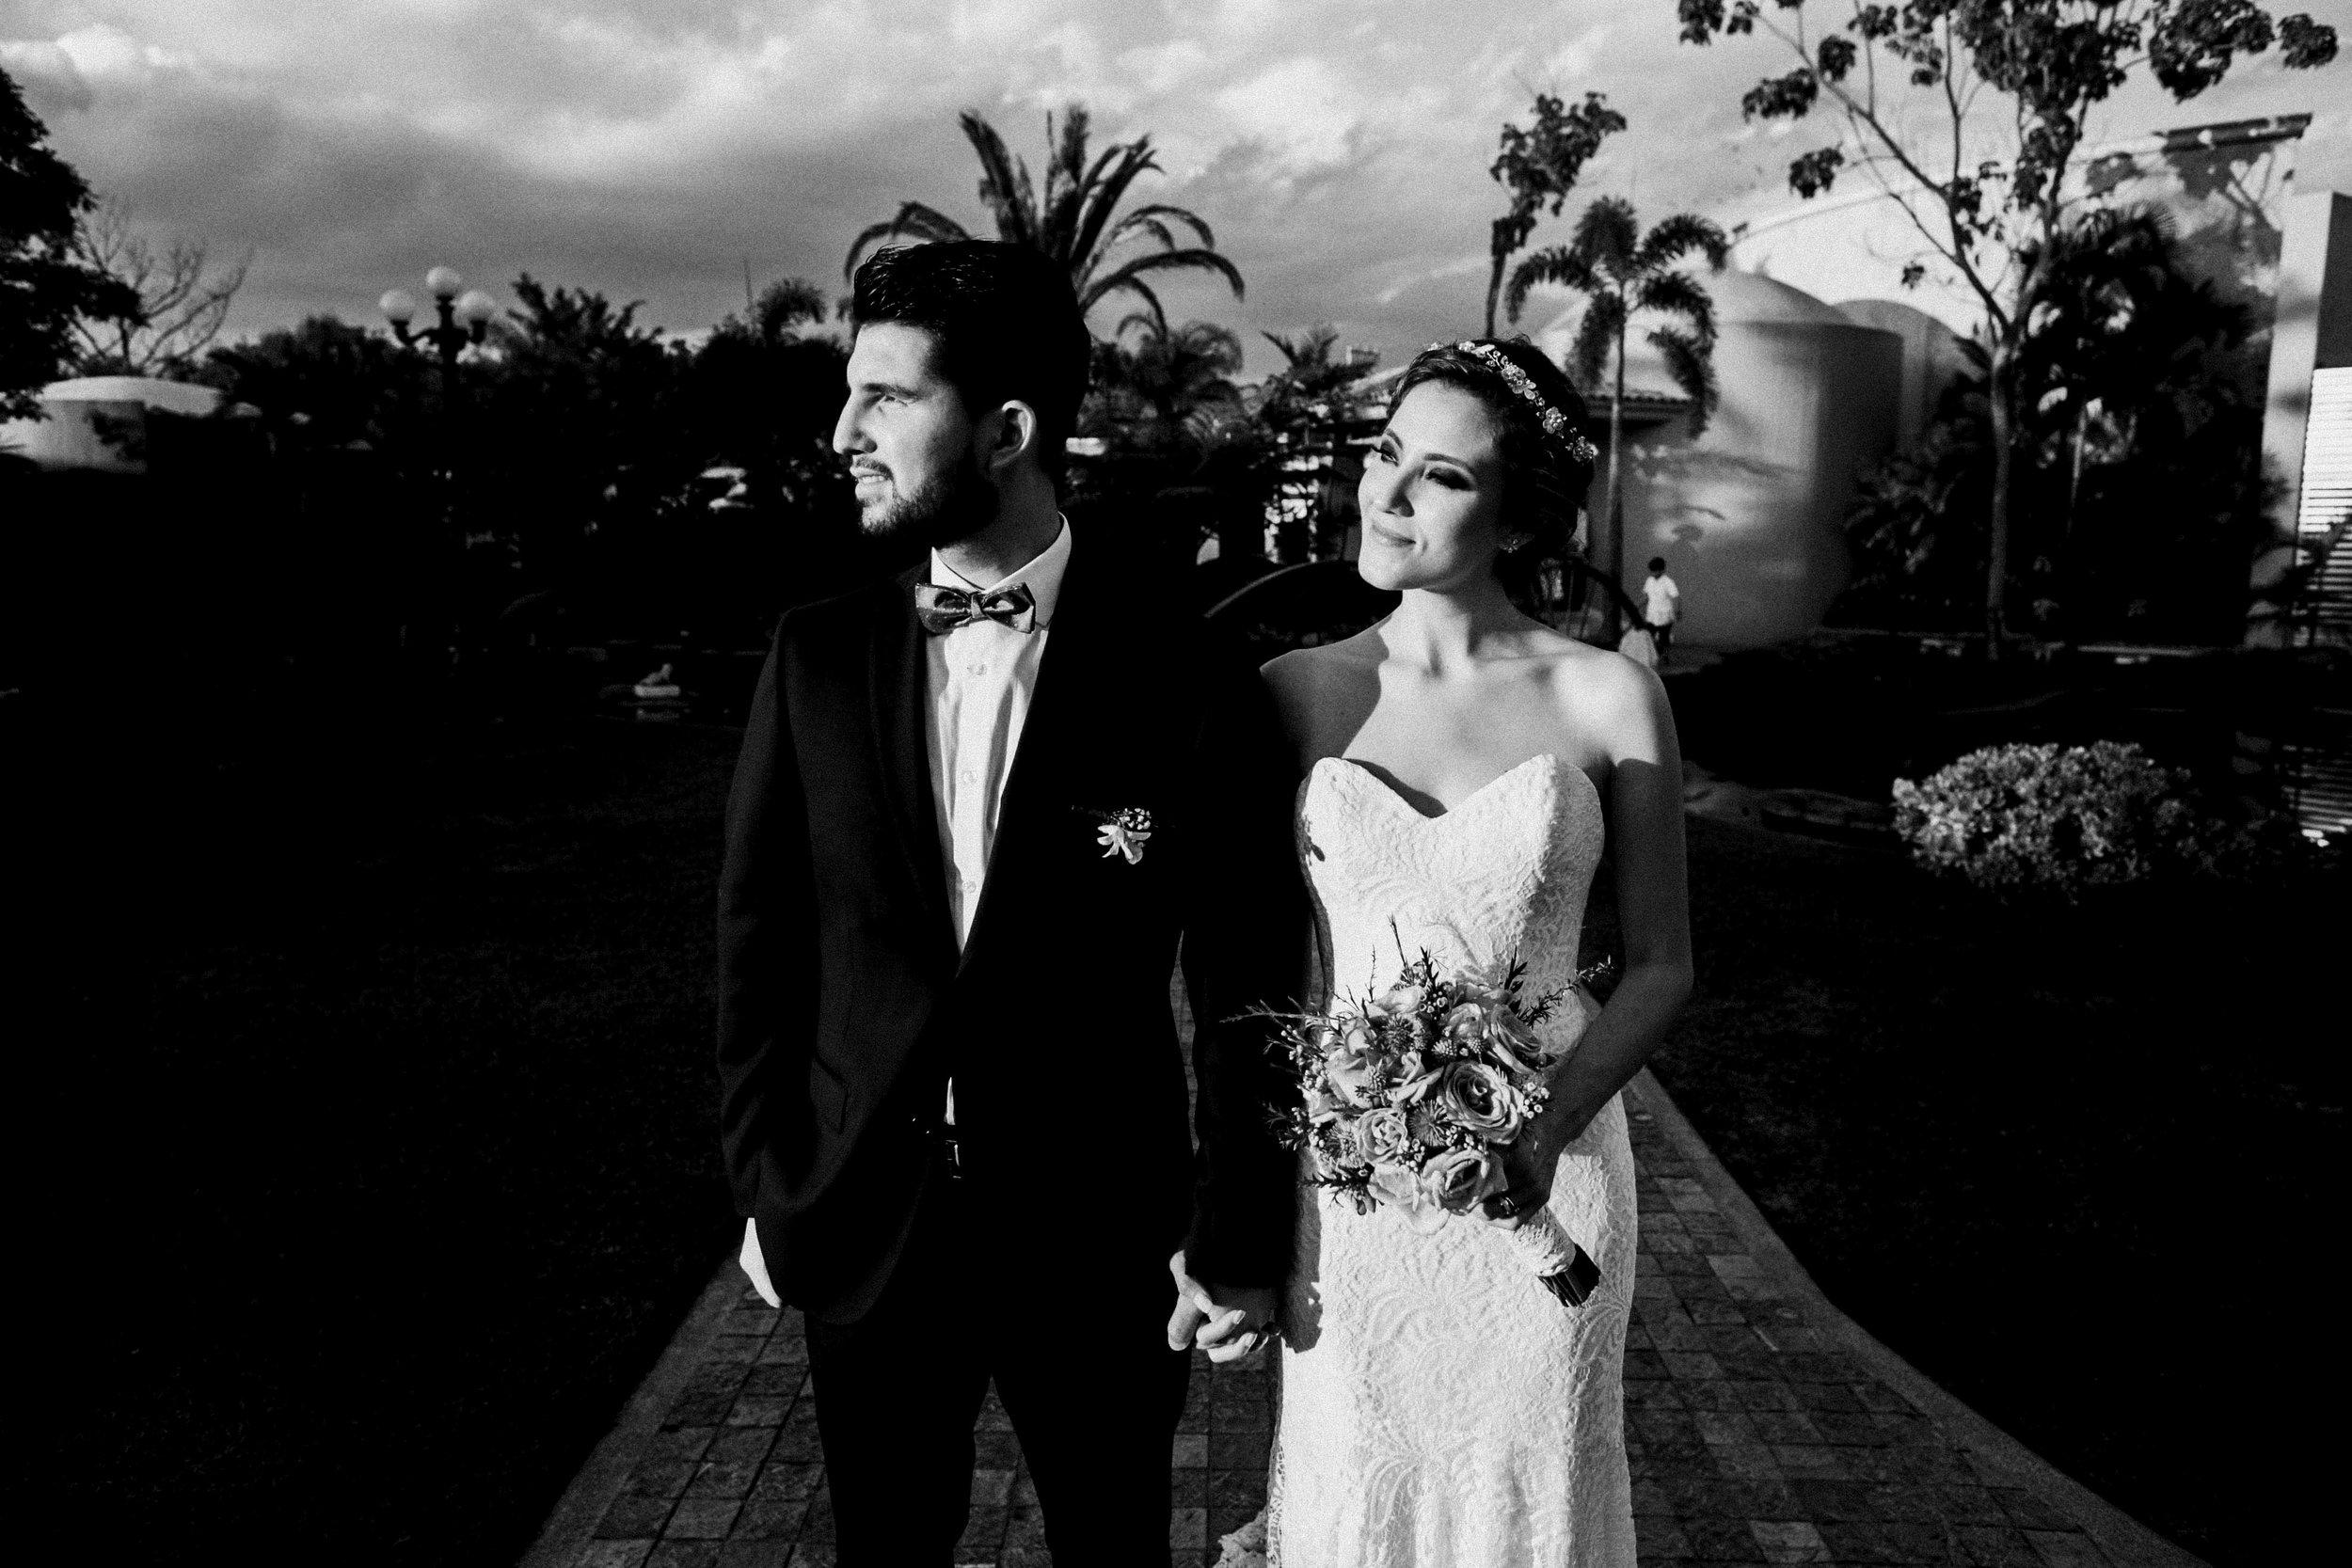 alfonso_flores_destination_wedding_photography_jardin_amarello_cuernavaca62.jpg